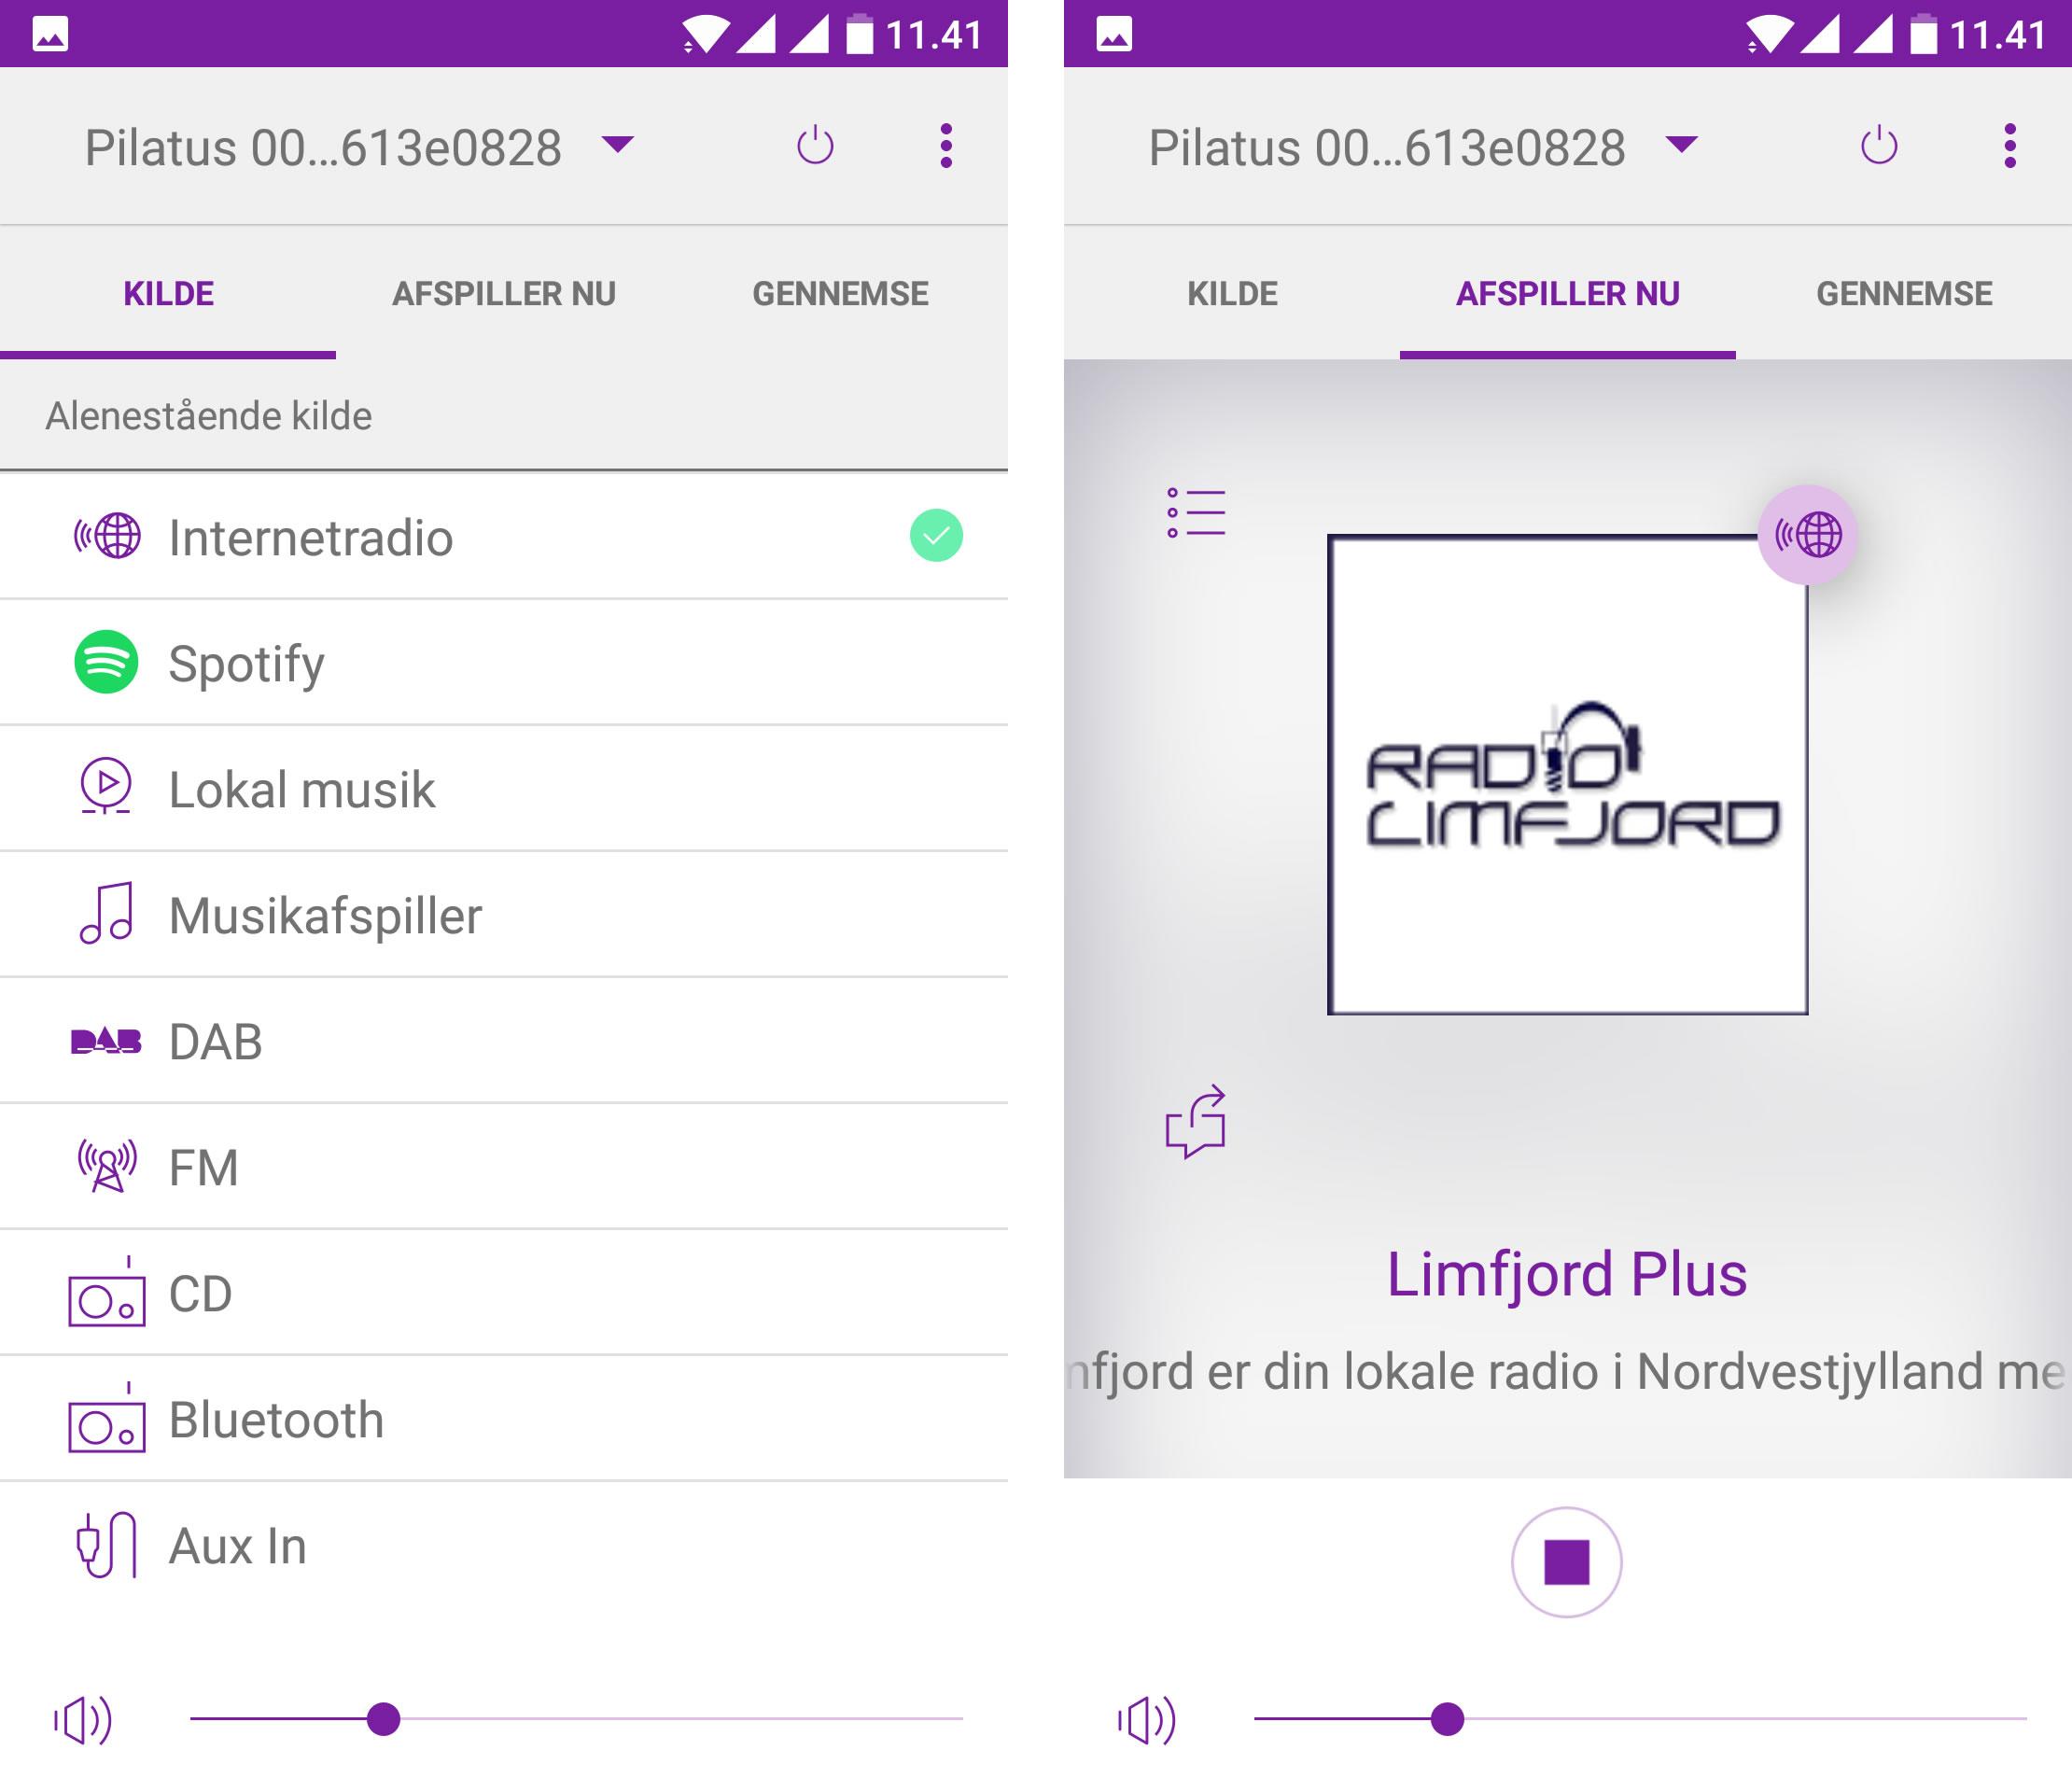 PTEC Pilatus digitalradio kan nemt betjenes via App. Uanset om du er Android eller Apple fan.